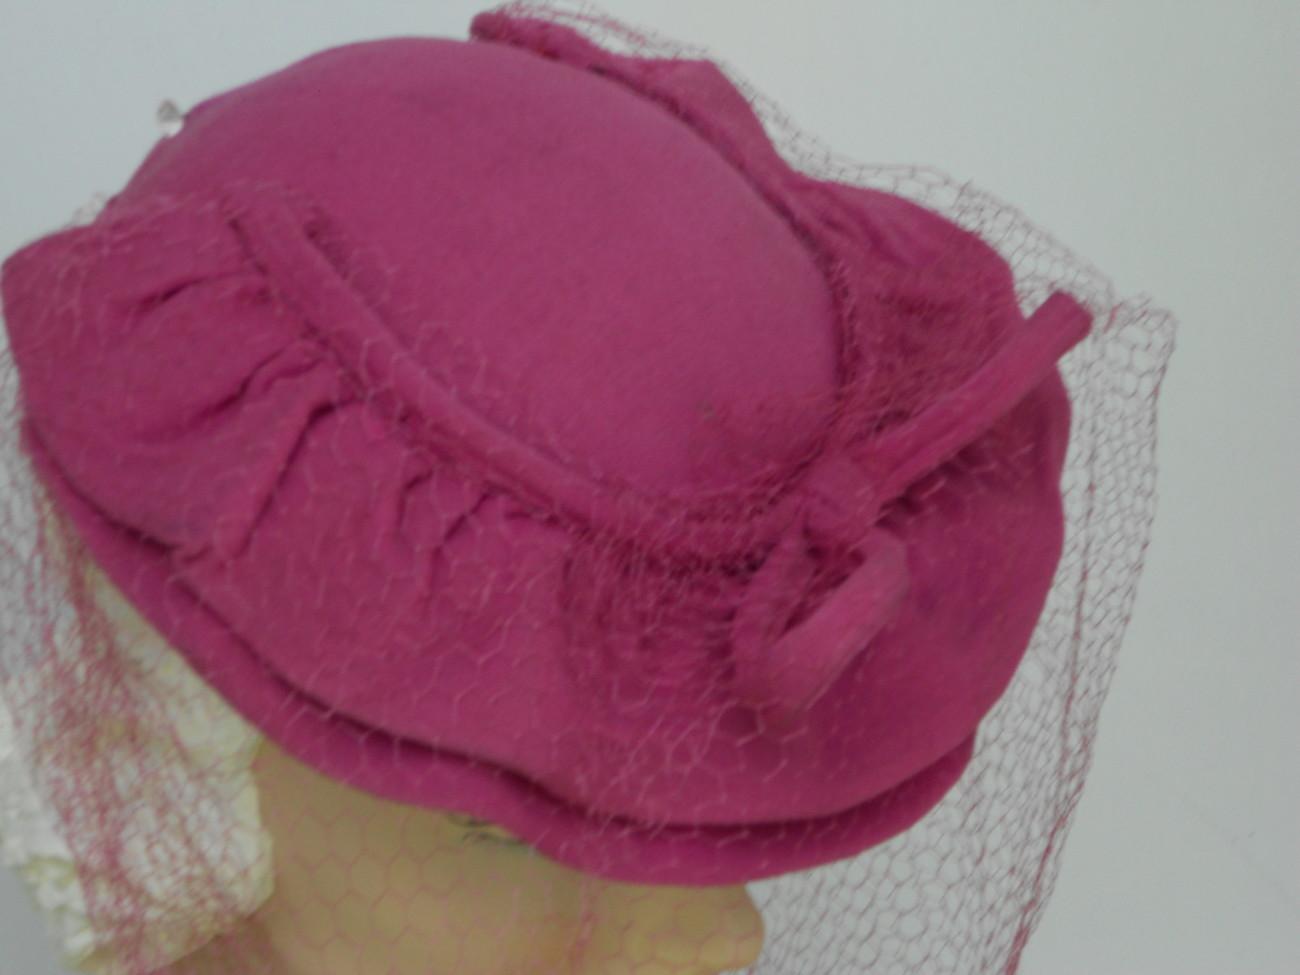 Vtg Hat 1930 40s WWII Ruffled Pink Skull Cap  w/Perfect Net Full Face Veil VCG